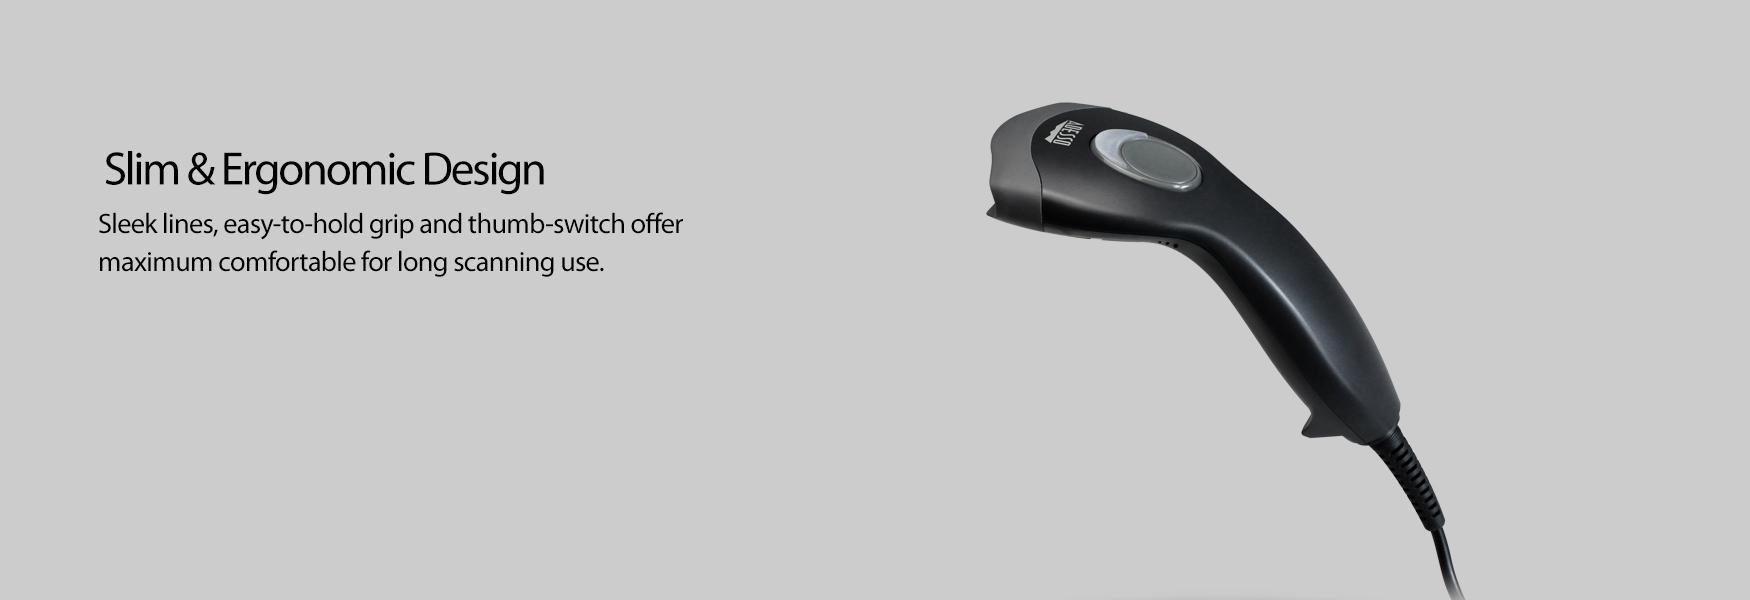 NuScan™ 2100 Slim Long Range Handheld CCD Barcode Scanner - Adesso ...